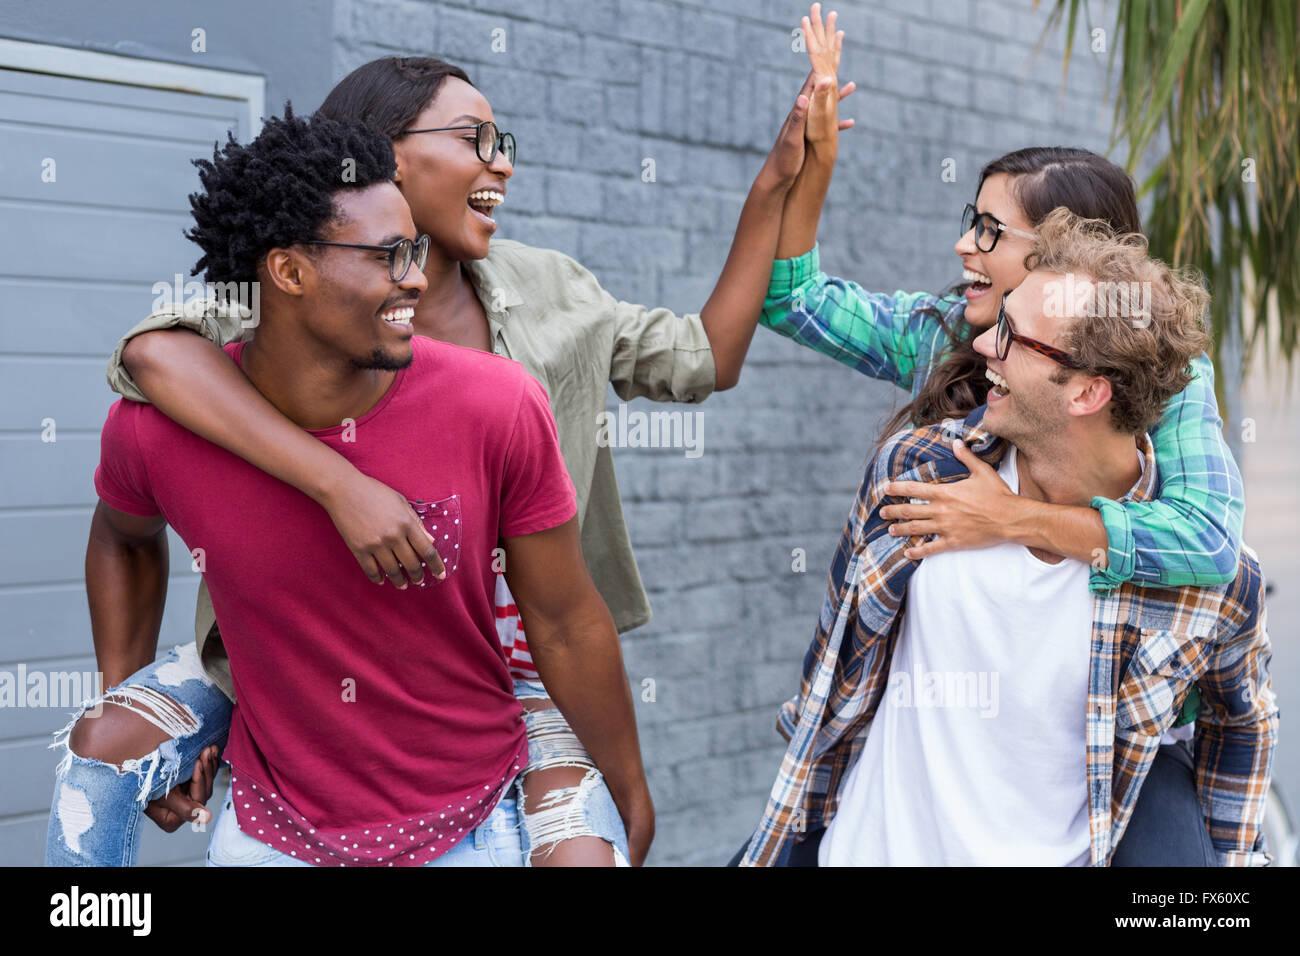 Young men giving piggyback to women - Stock Image